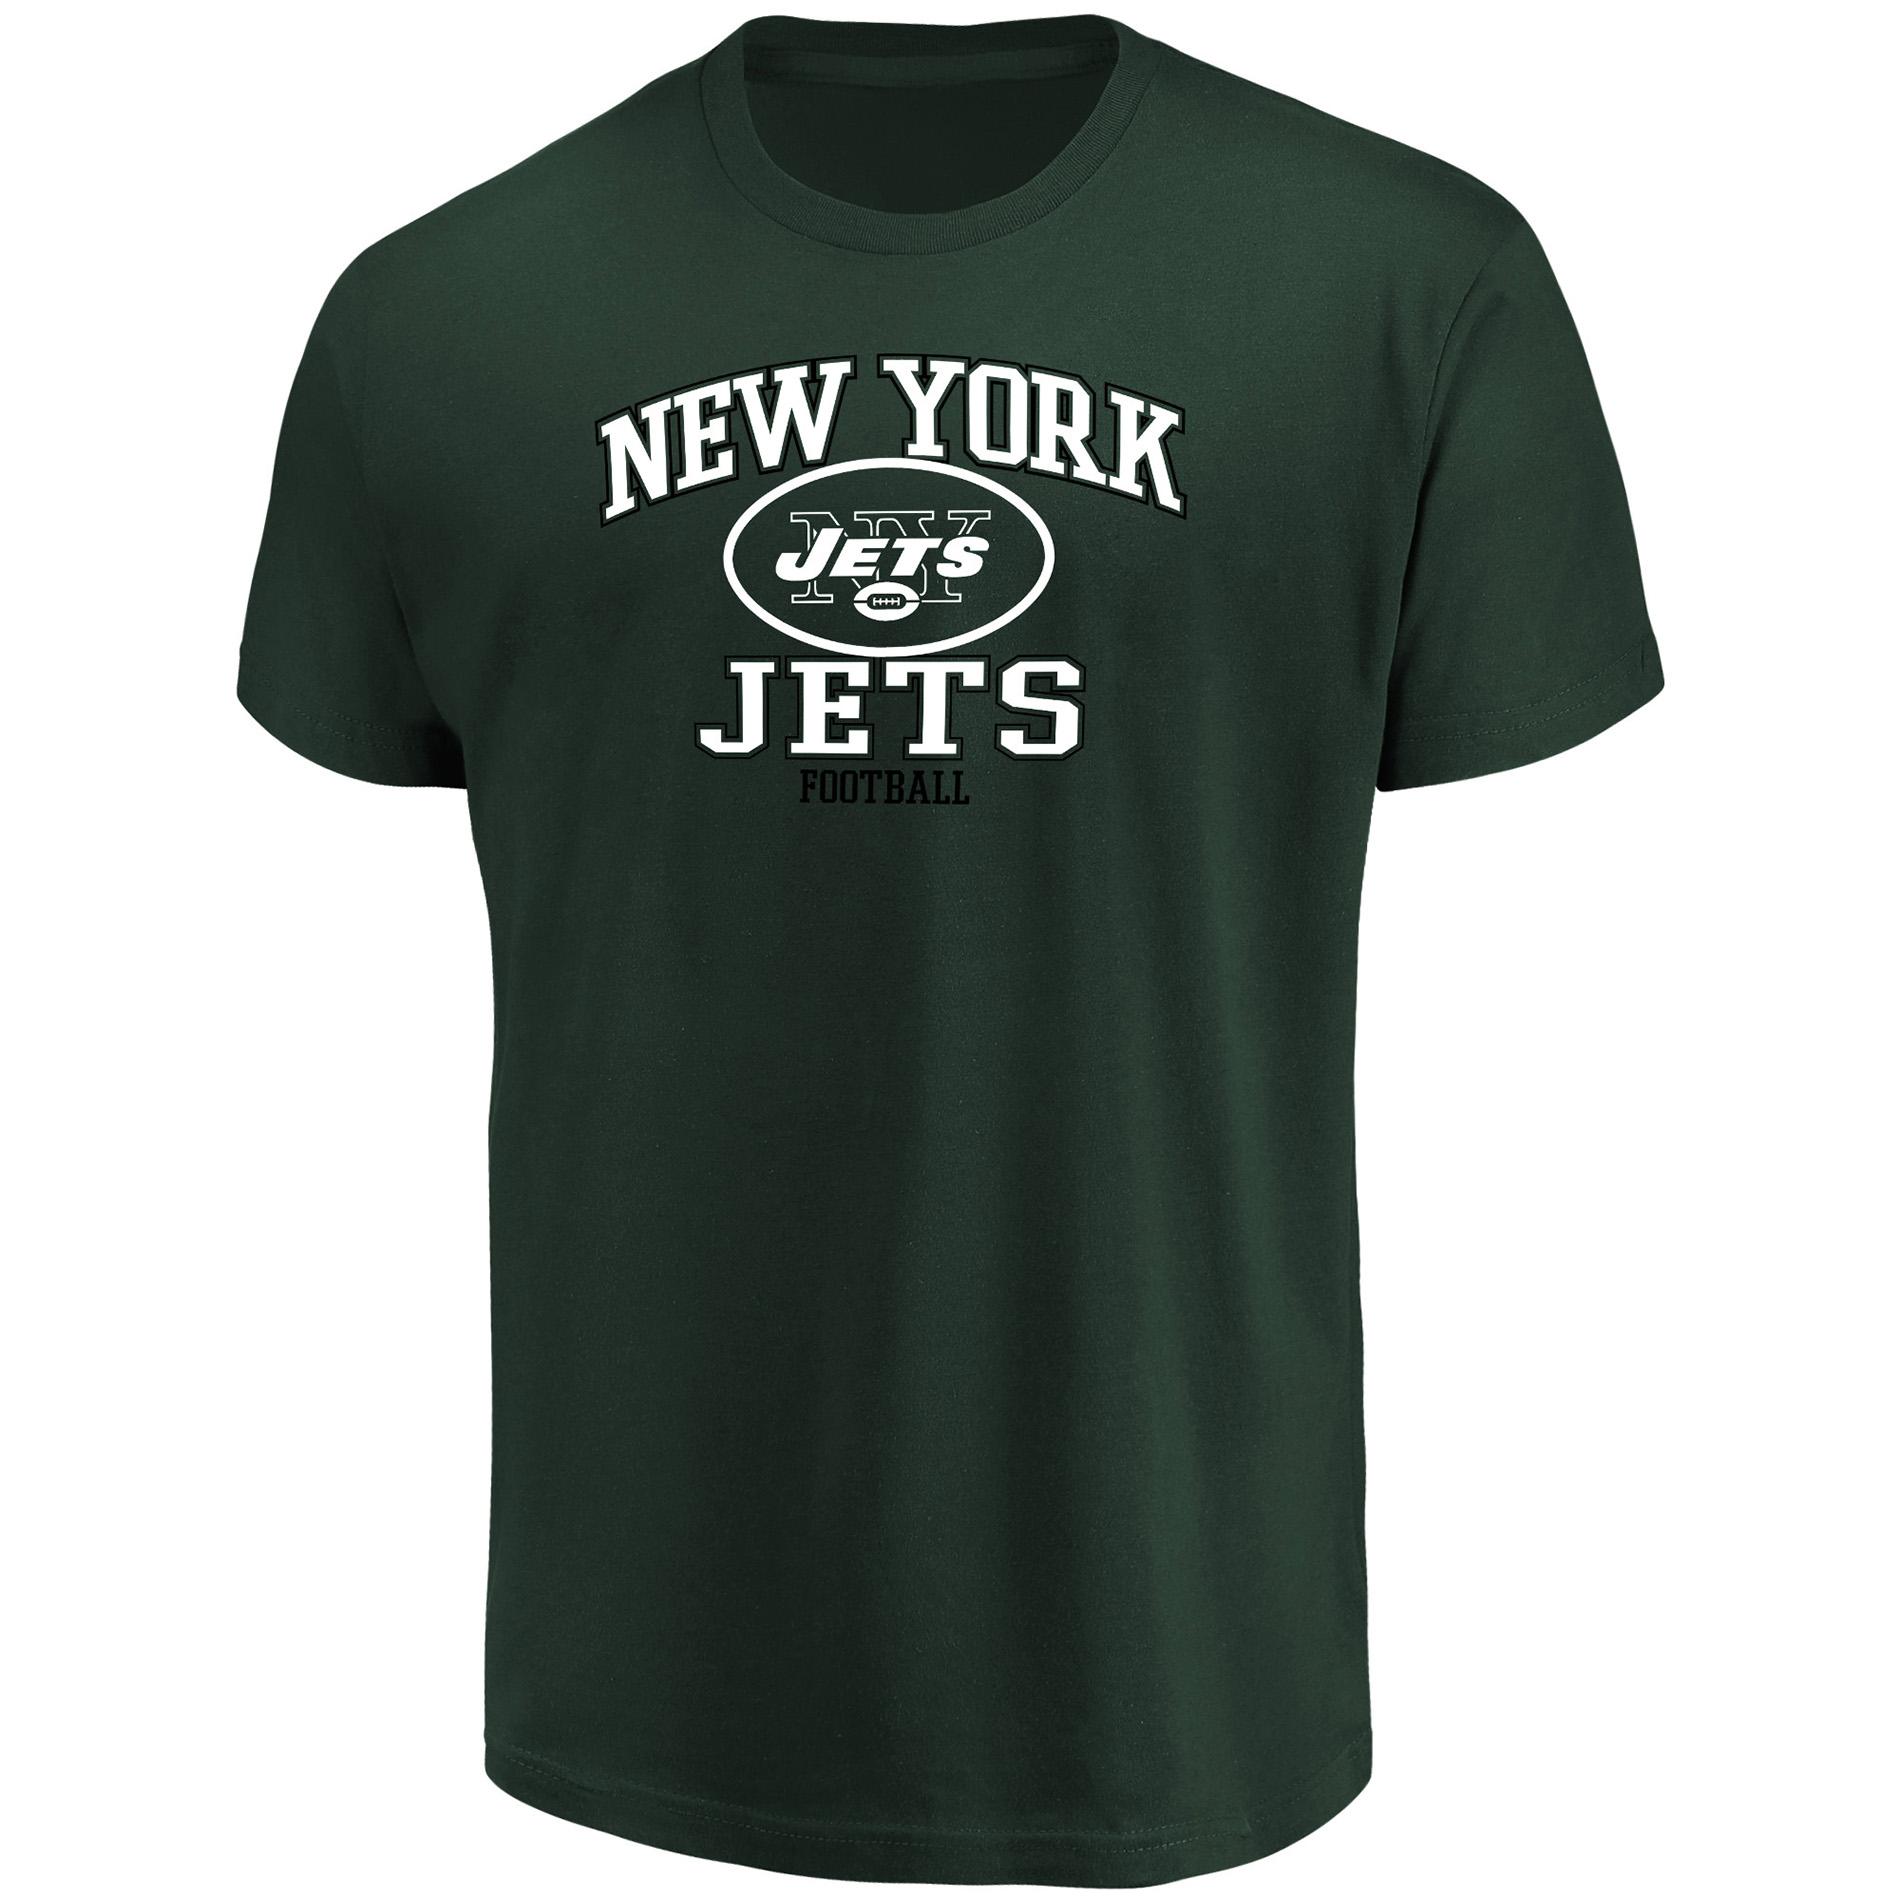 Nfl Men Graphic Short-sleeve T-shirt - York Jets